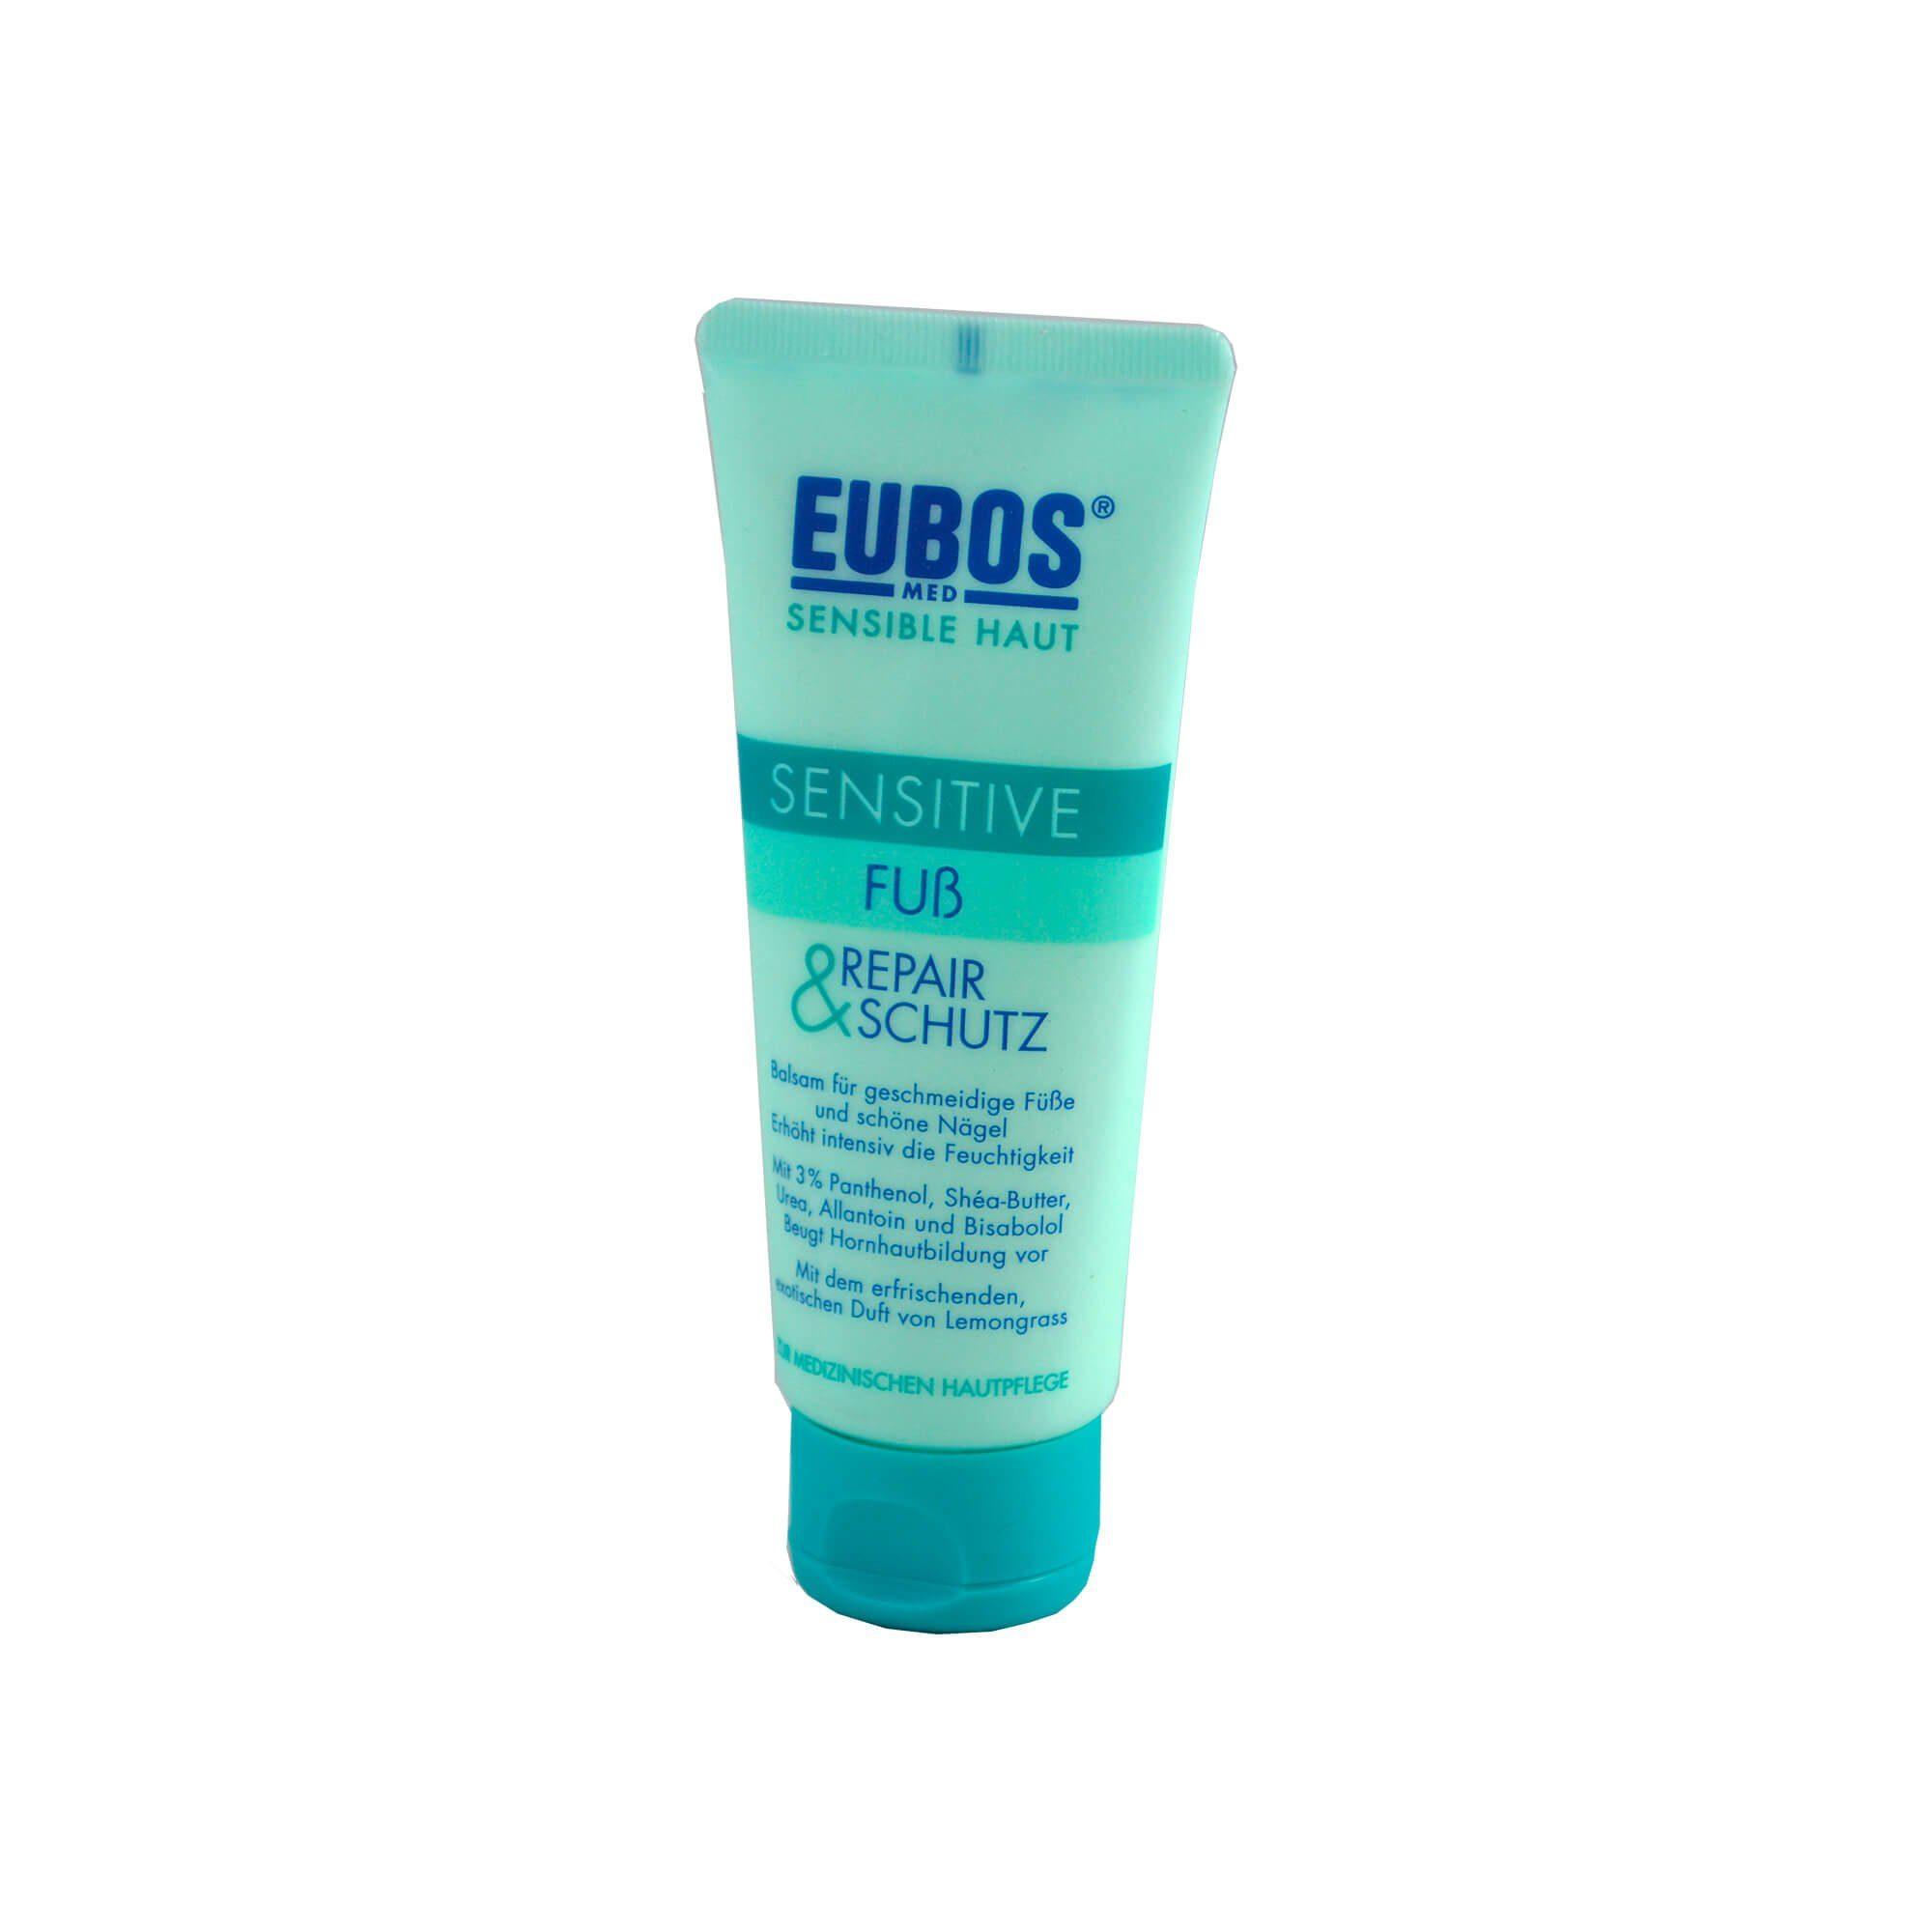 Eubos Sensitive Fuss Repair + Schutzcreme, 100 ml